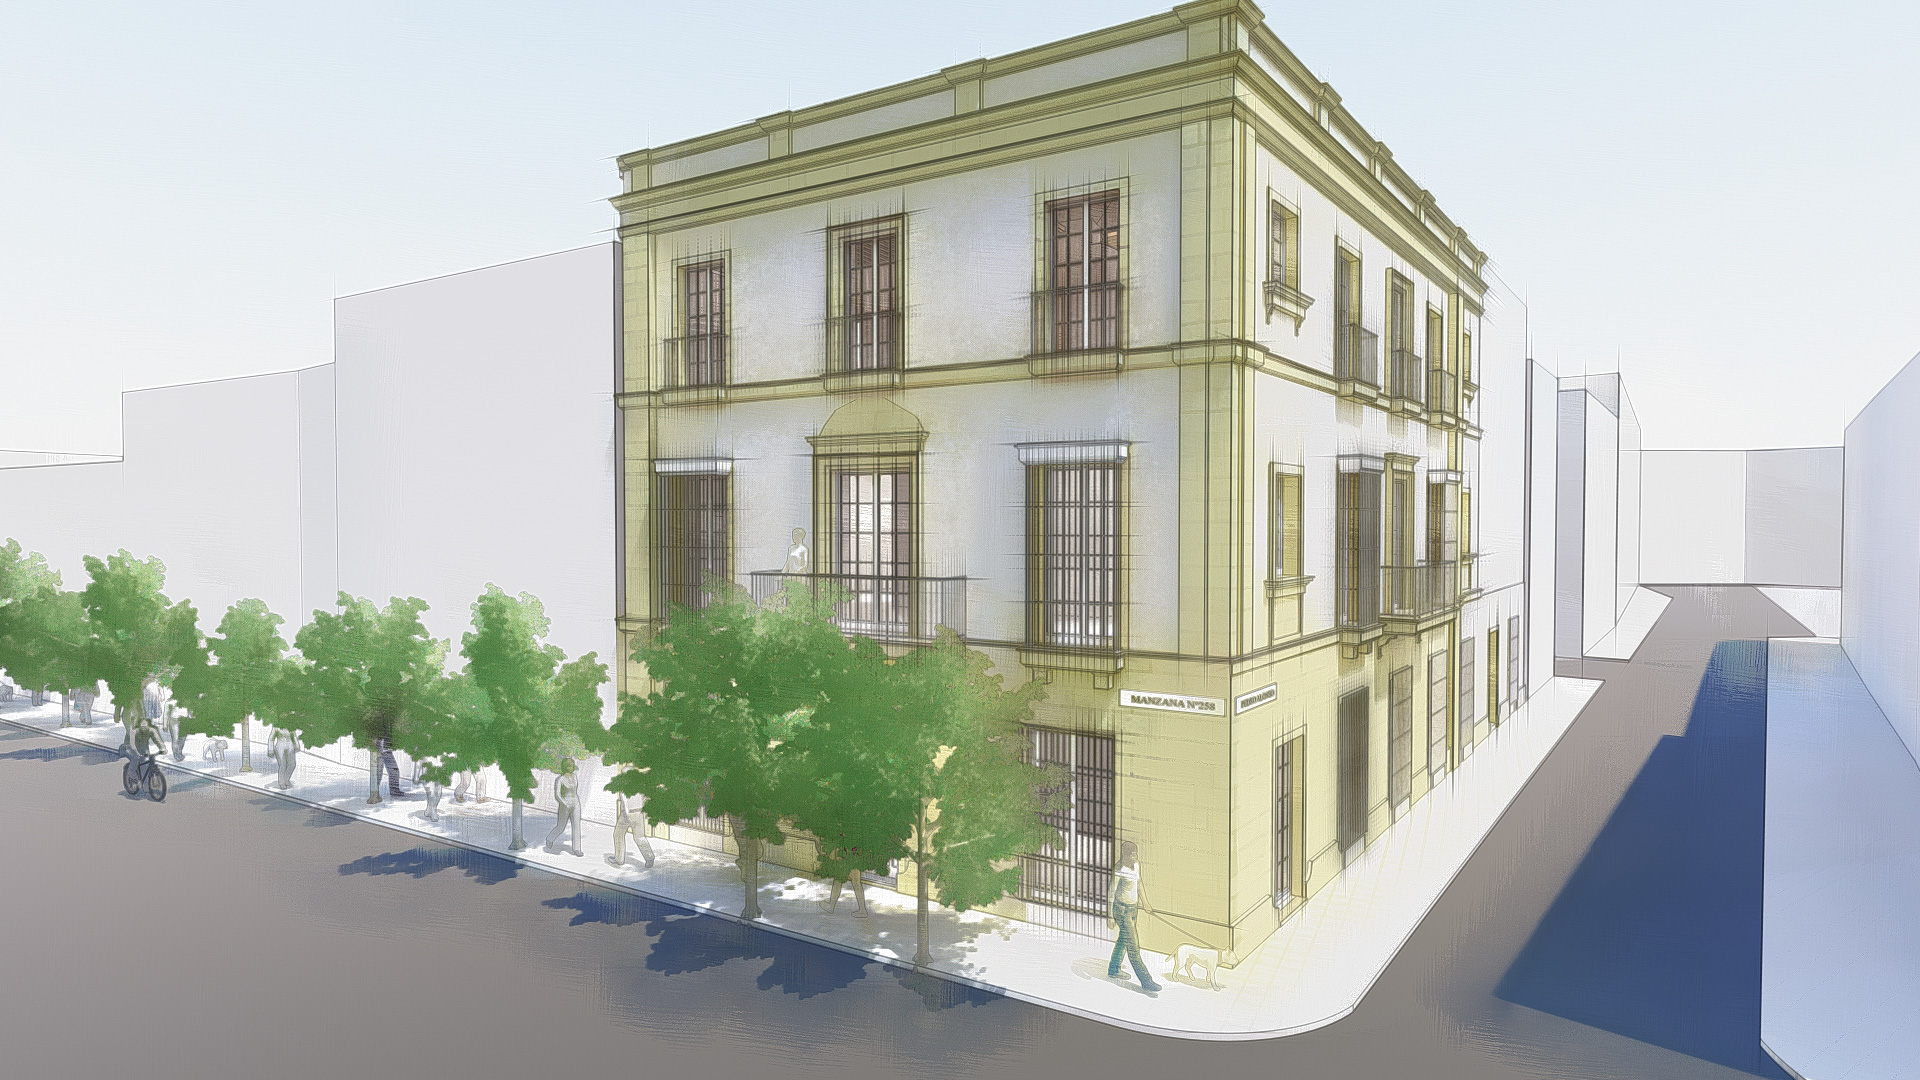 Proyecto básico rehabilitación de edificio en Jerez